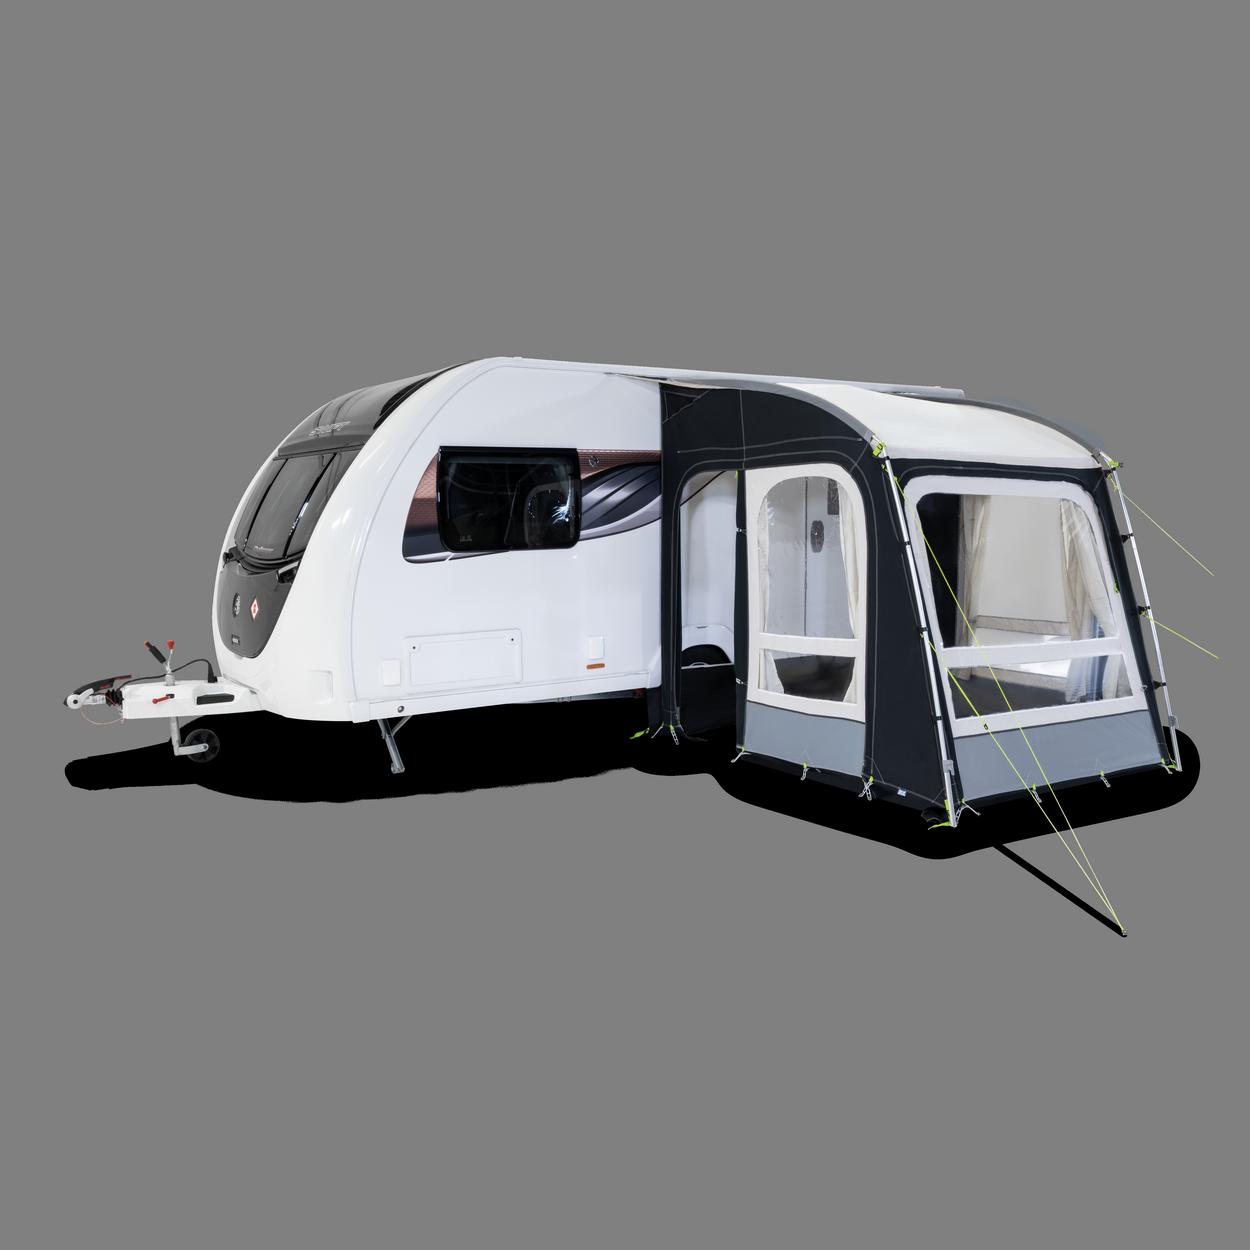 Kampa Dometic Rally Pro 200 Norwich Camping Aw0005